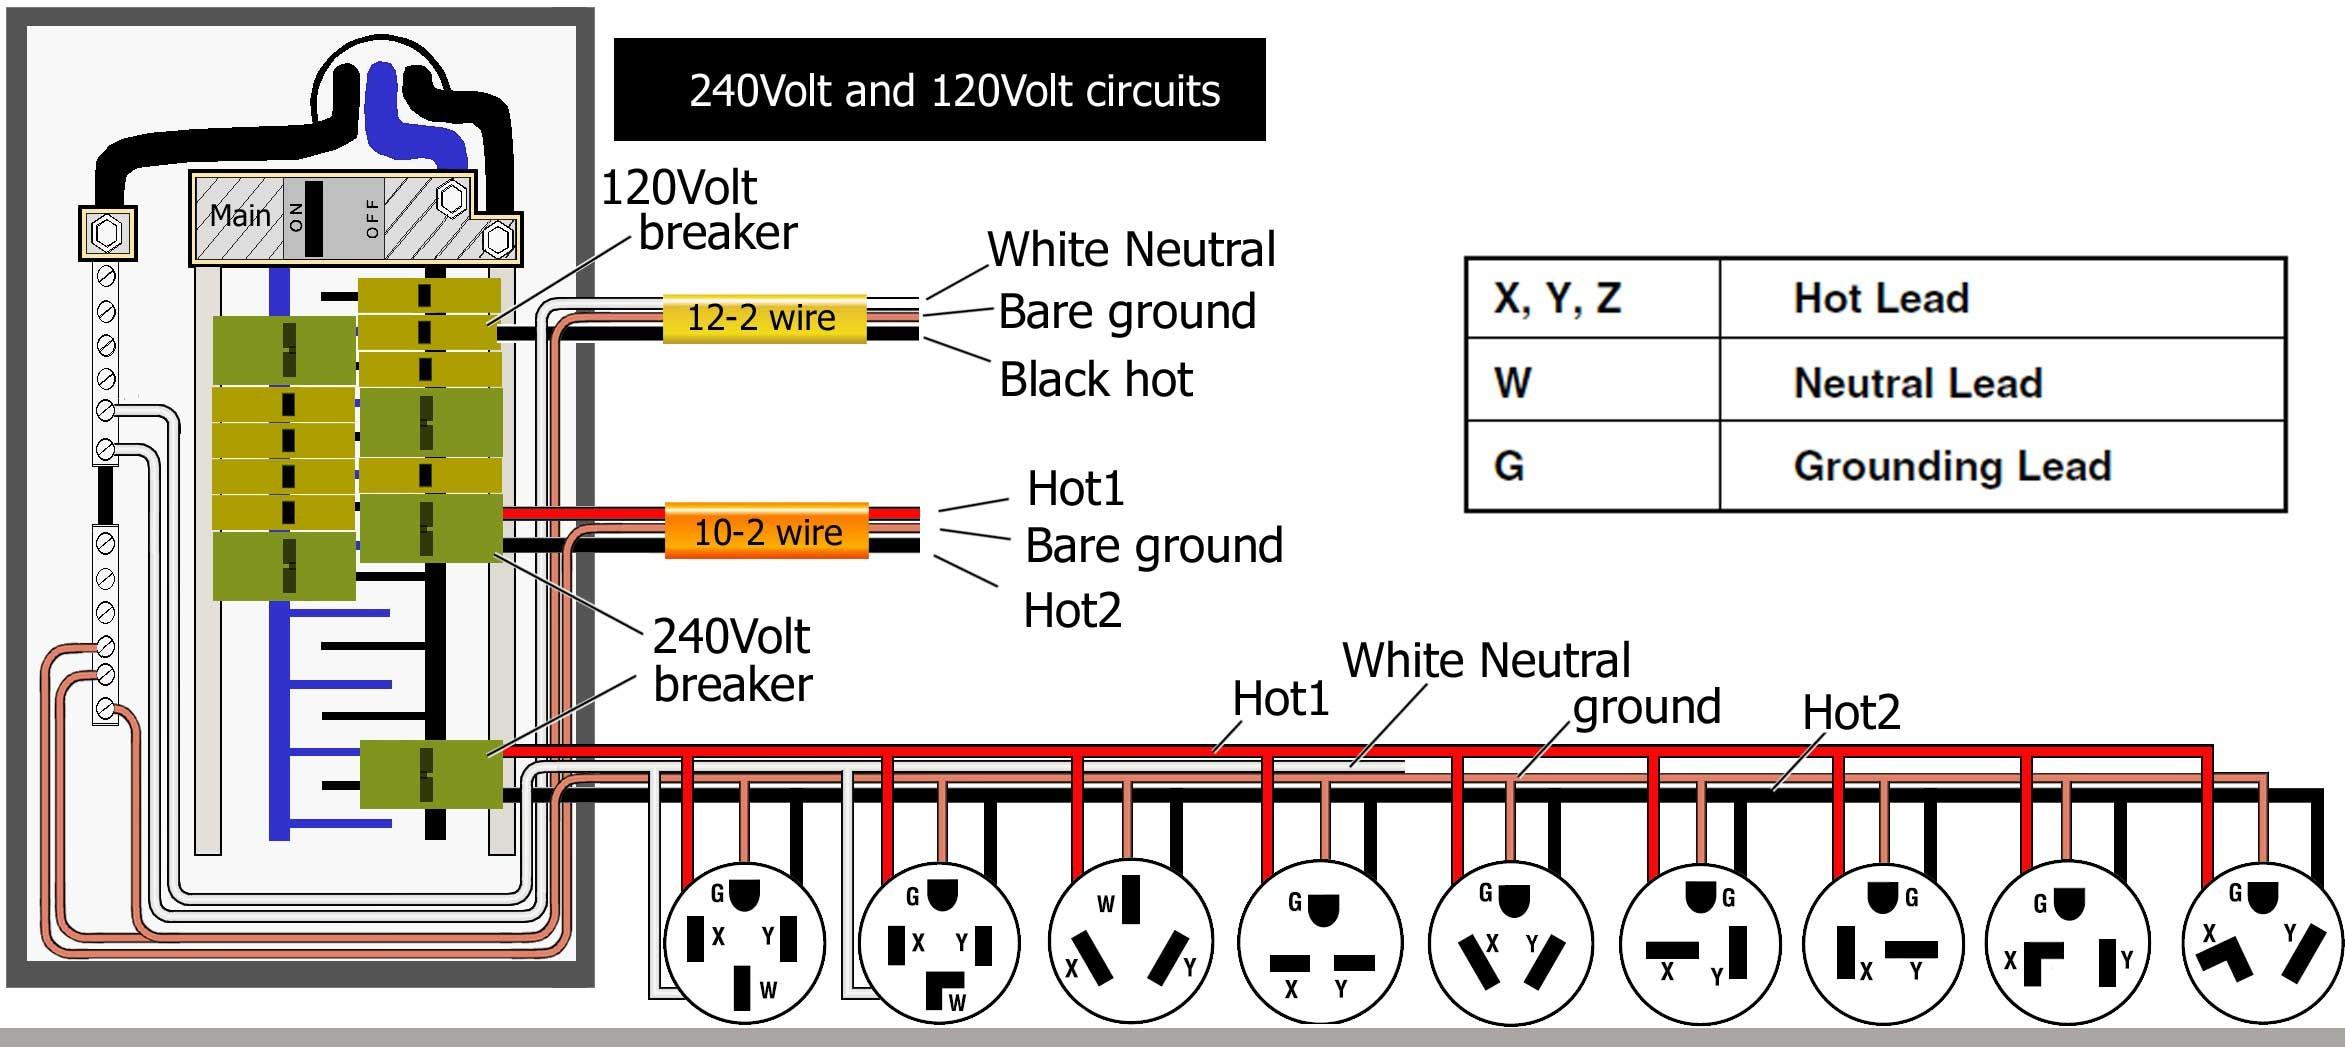 240 Volt Outlet2 218 Random 50 Amp Twist Lock Plug Wiring Diagram - 20 Amp Twist Lock Plug Wiring Diagram